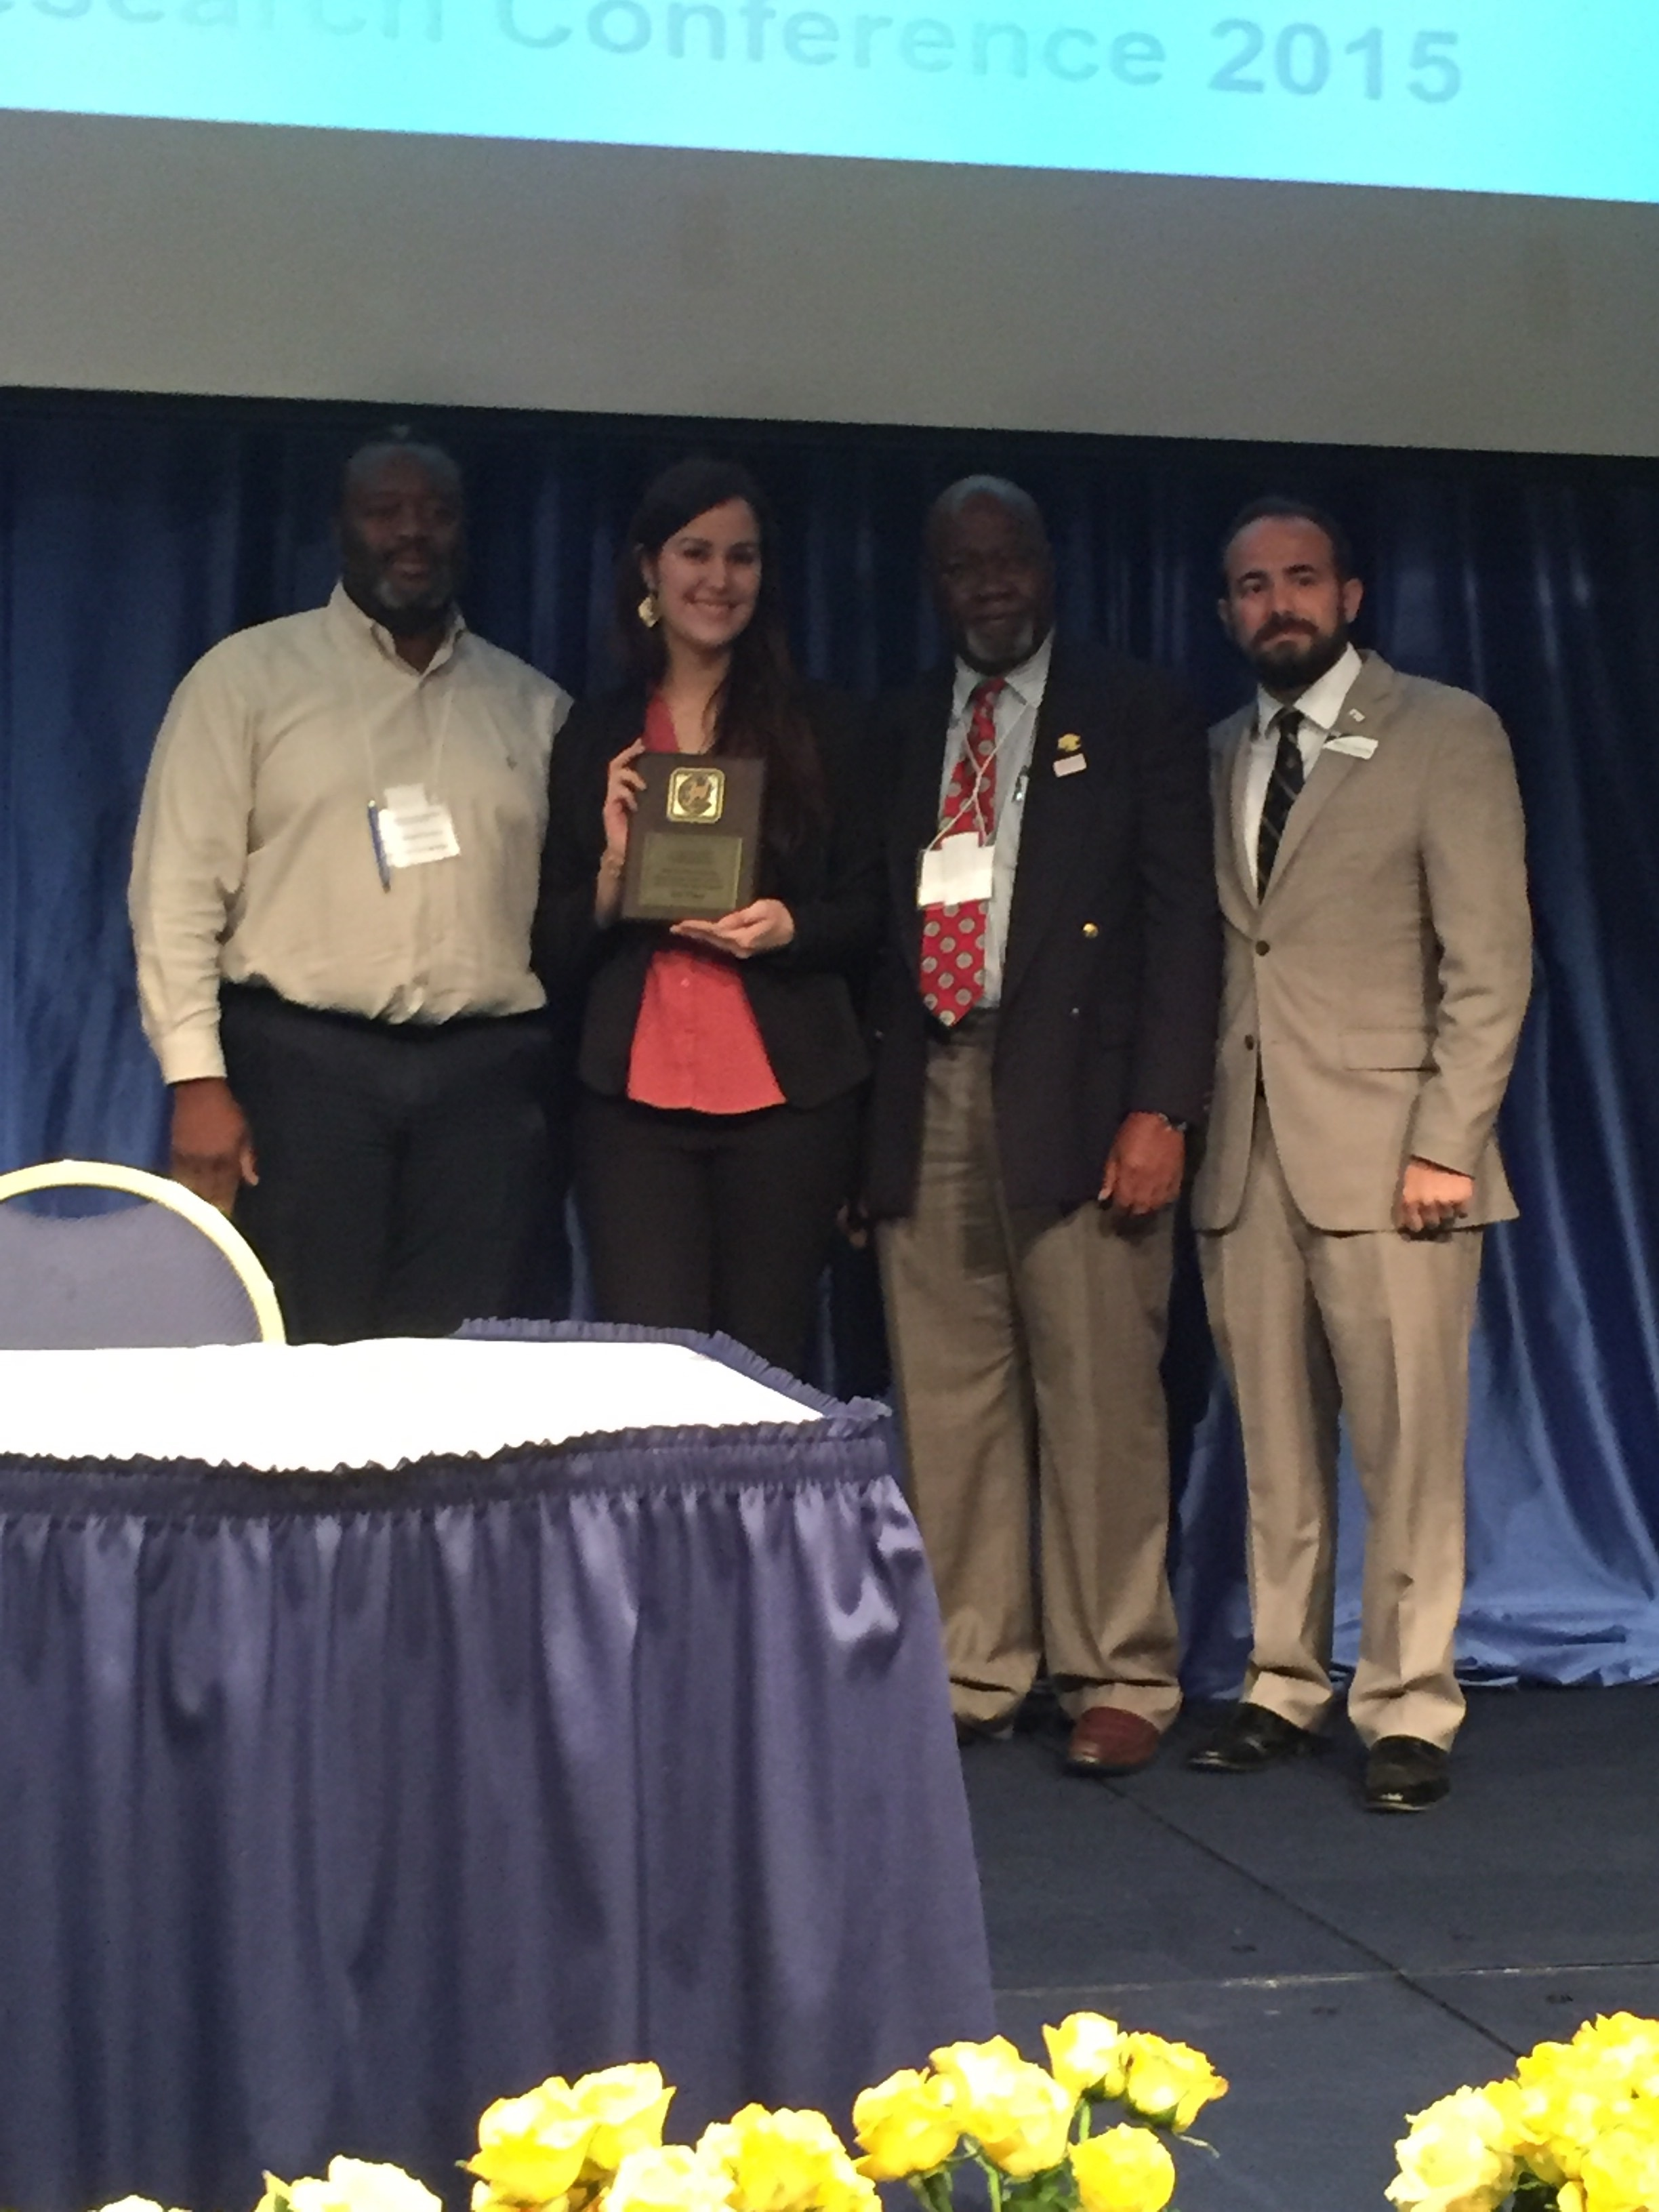 Ileana accepting her award